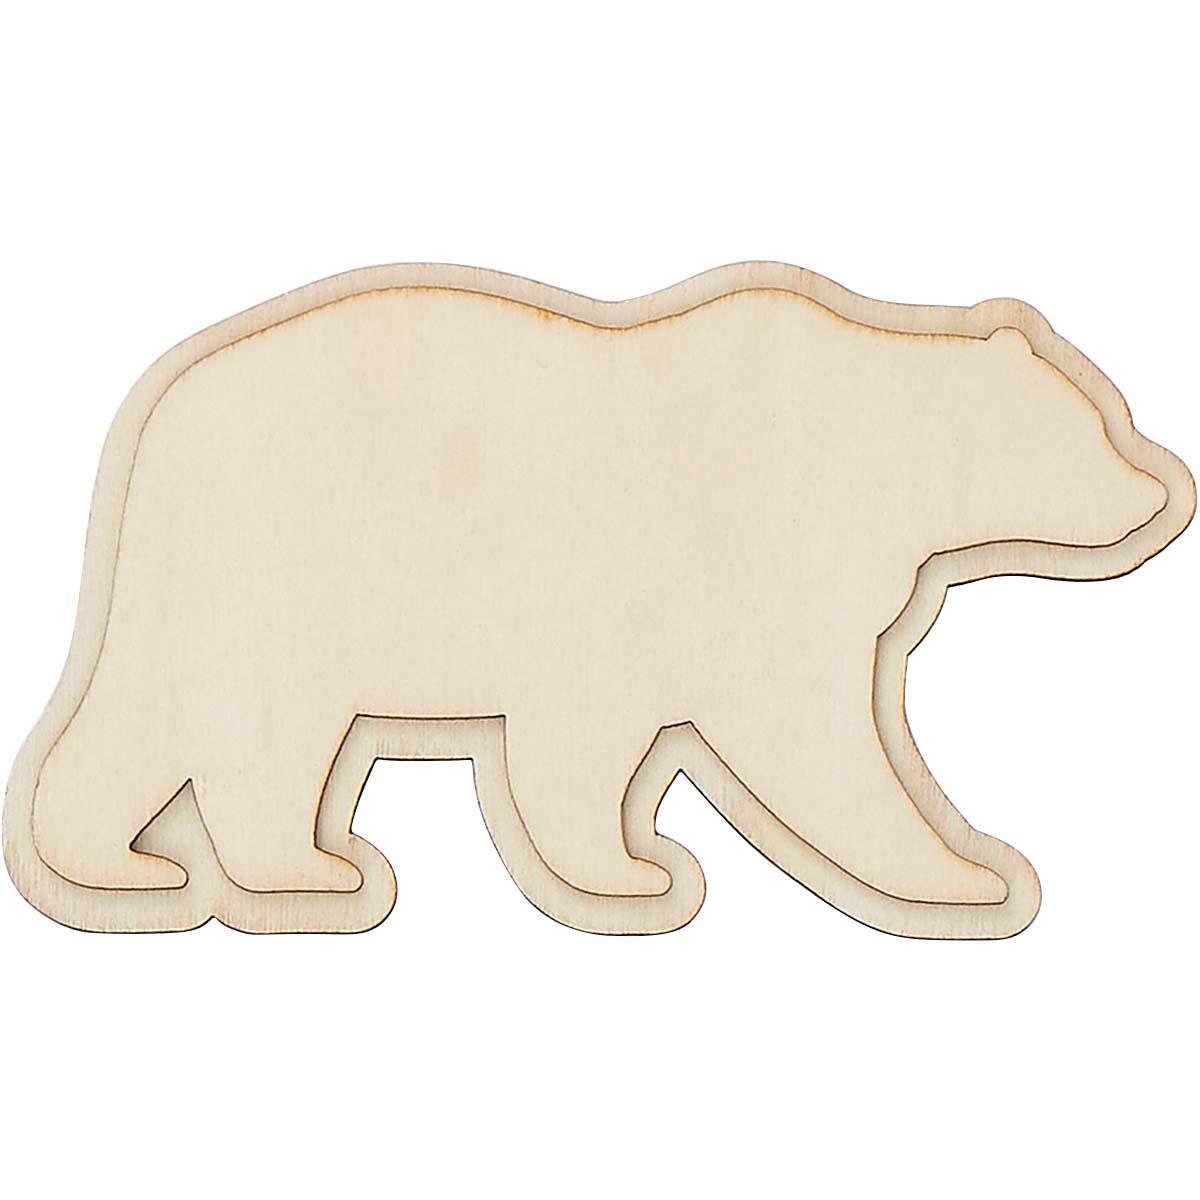 Plaid ® Wood Surfaces - Unpainted Layered Shapes - Bear - 44977